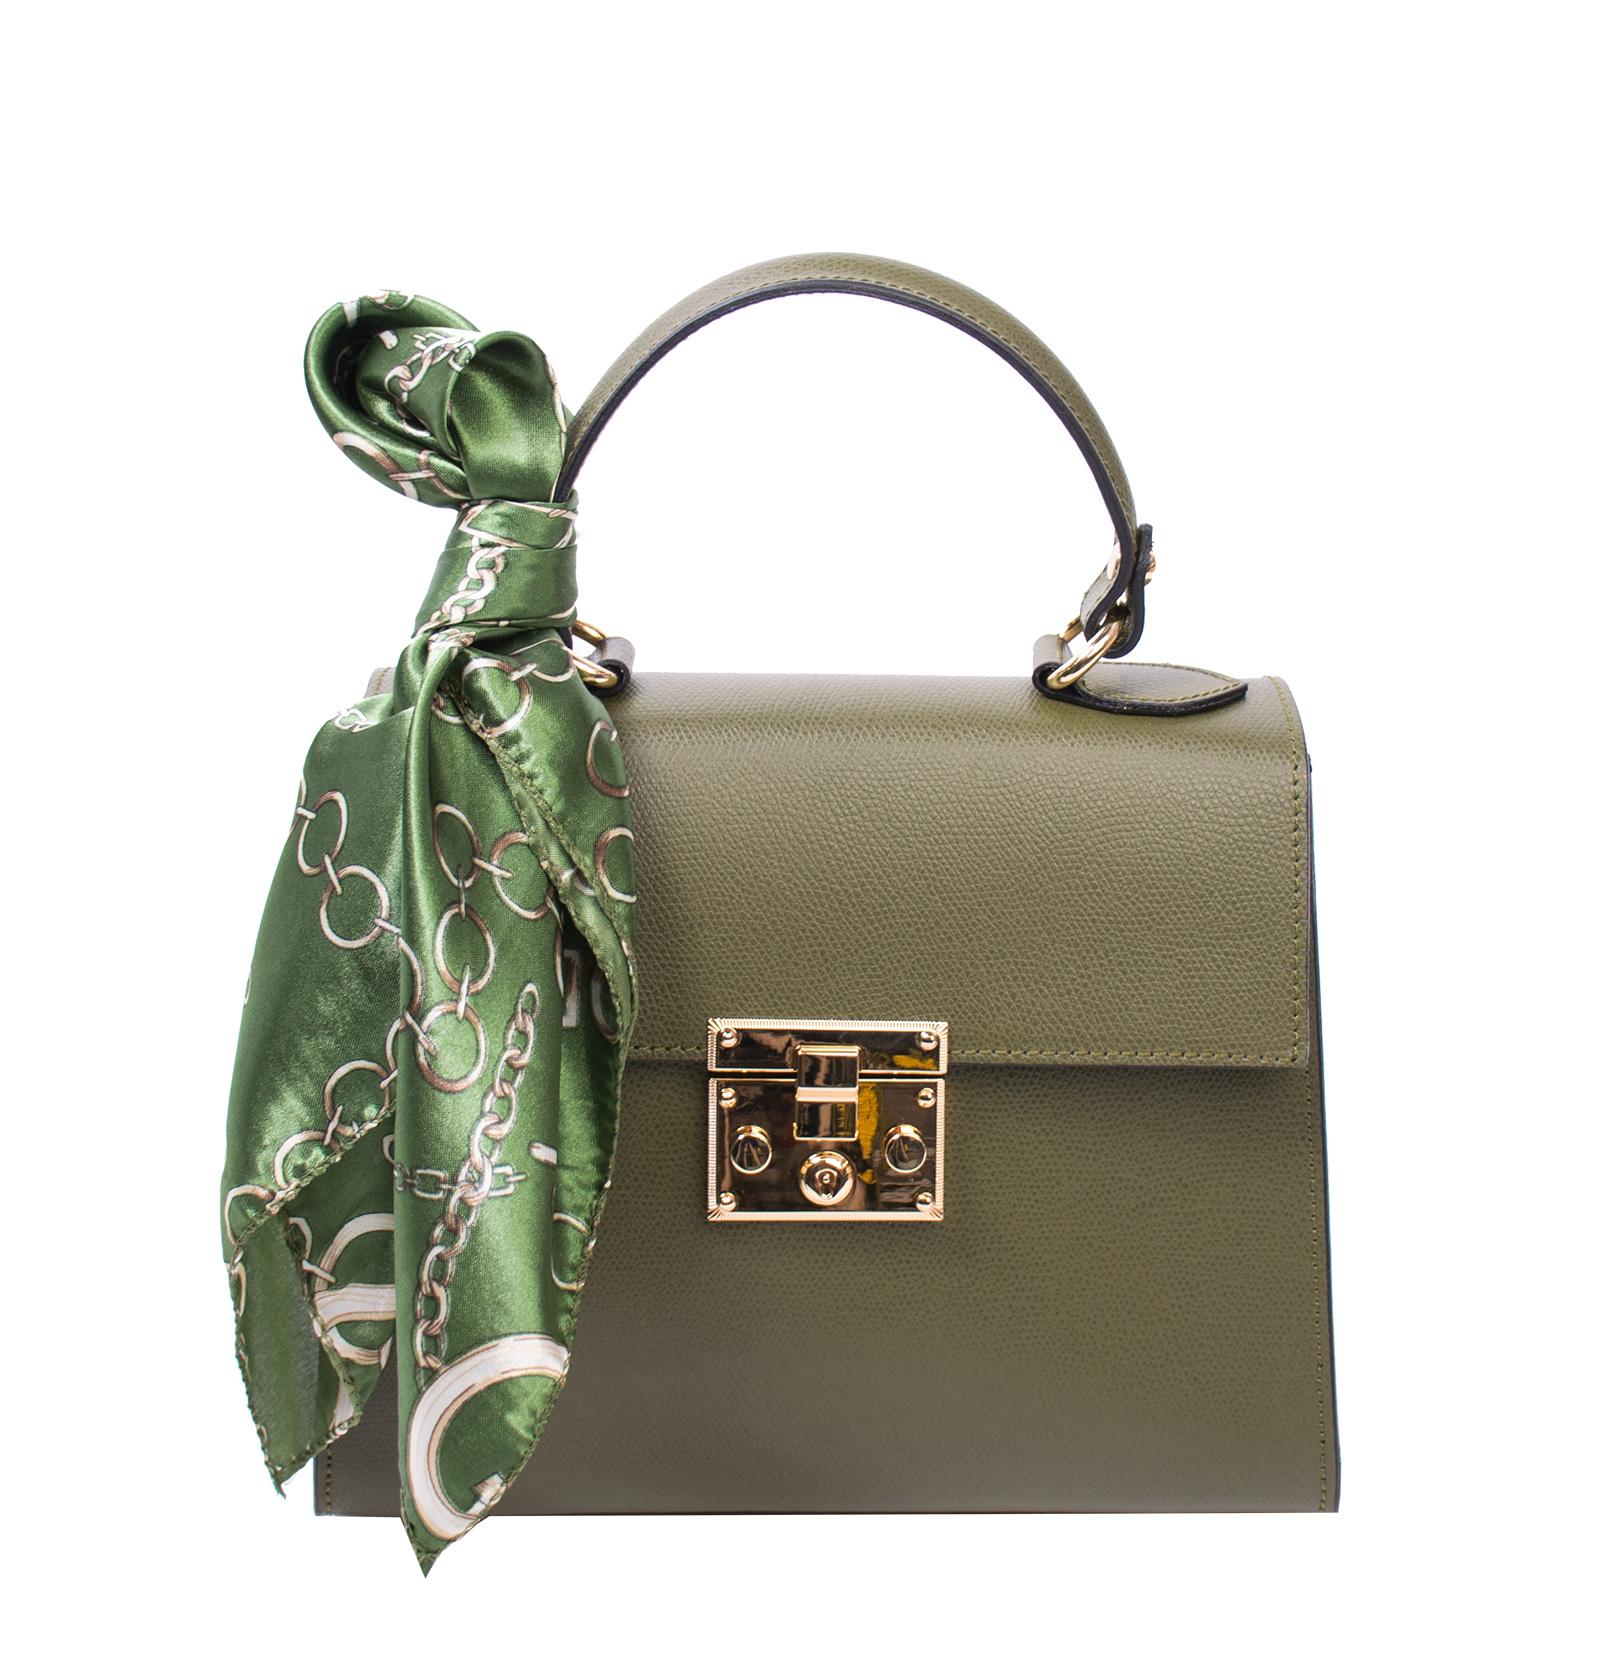 Bags and more Anett Keki Női Bőr Kézitáska